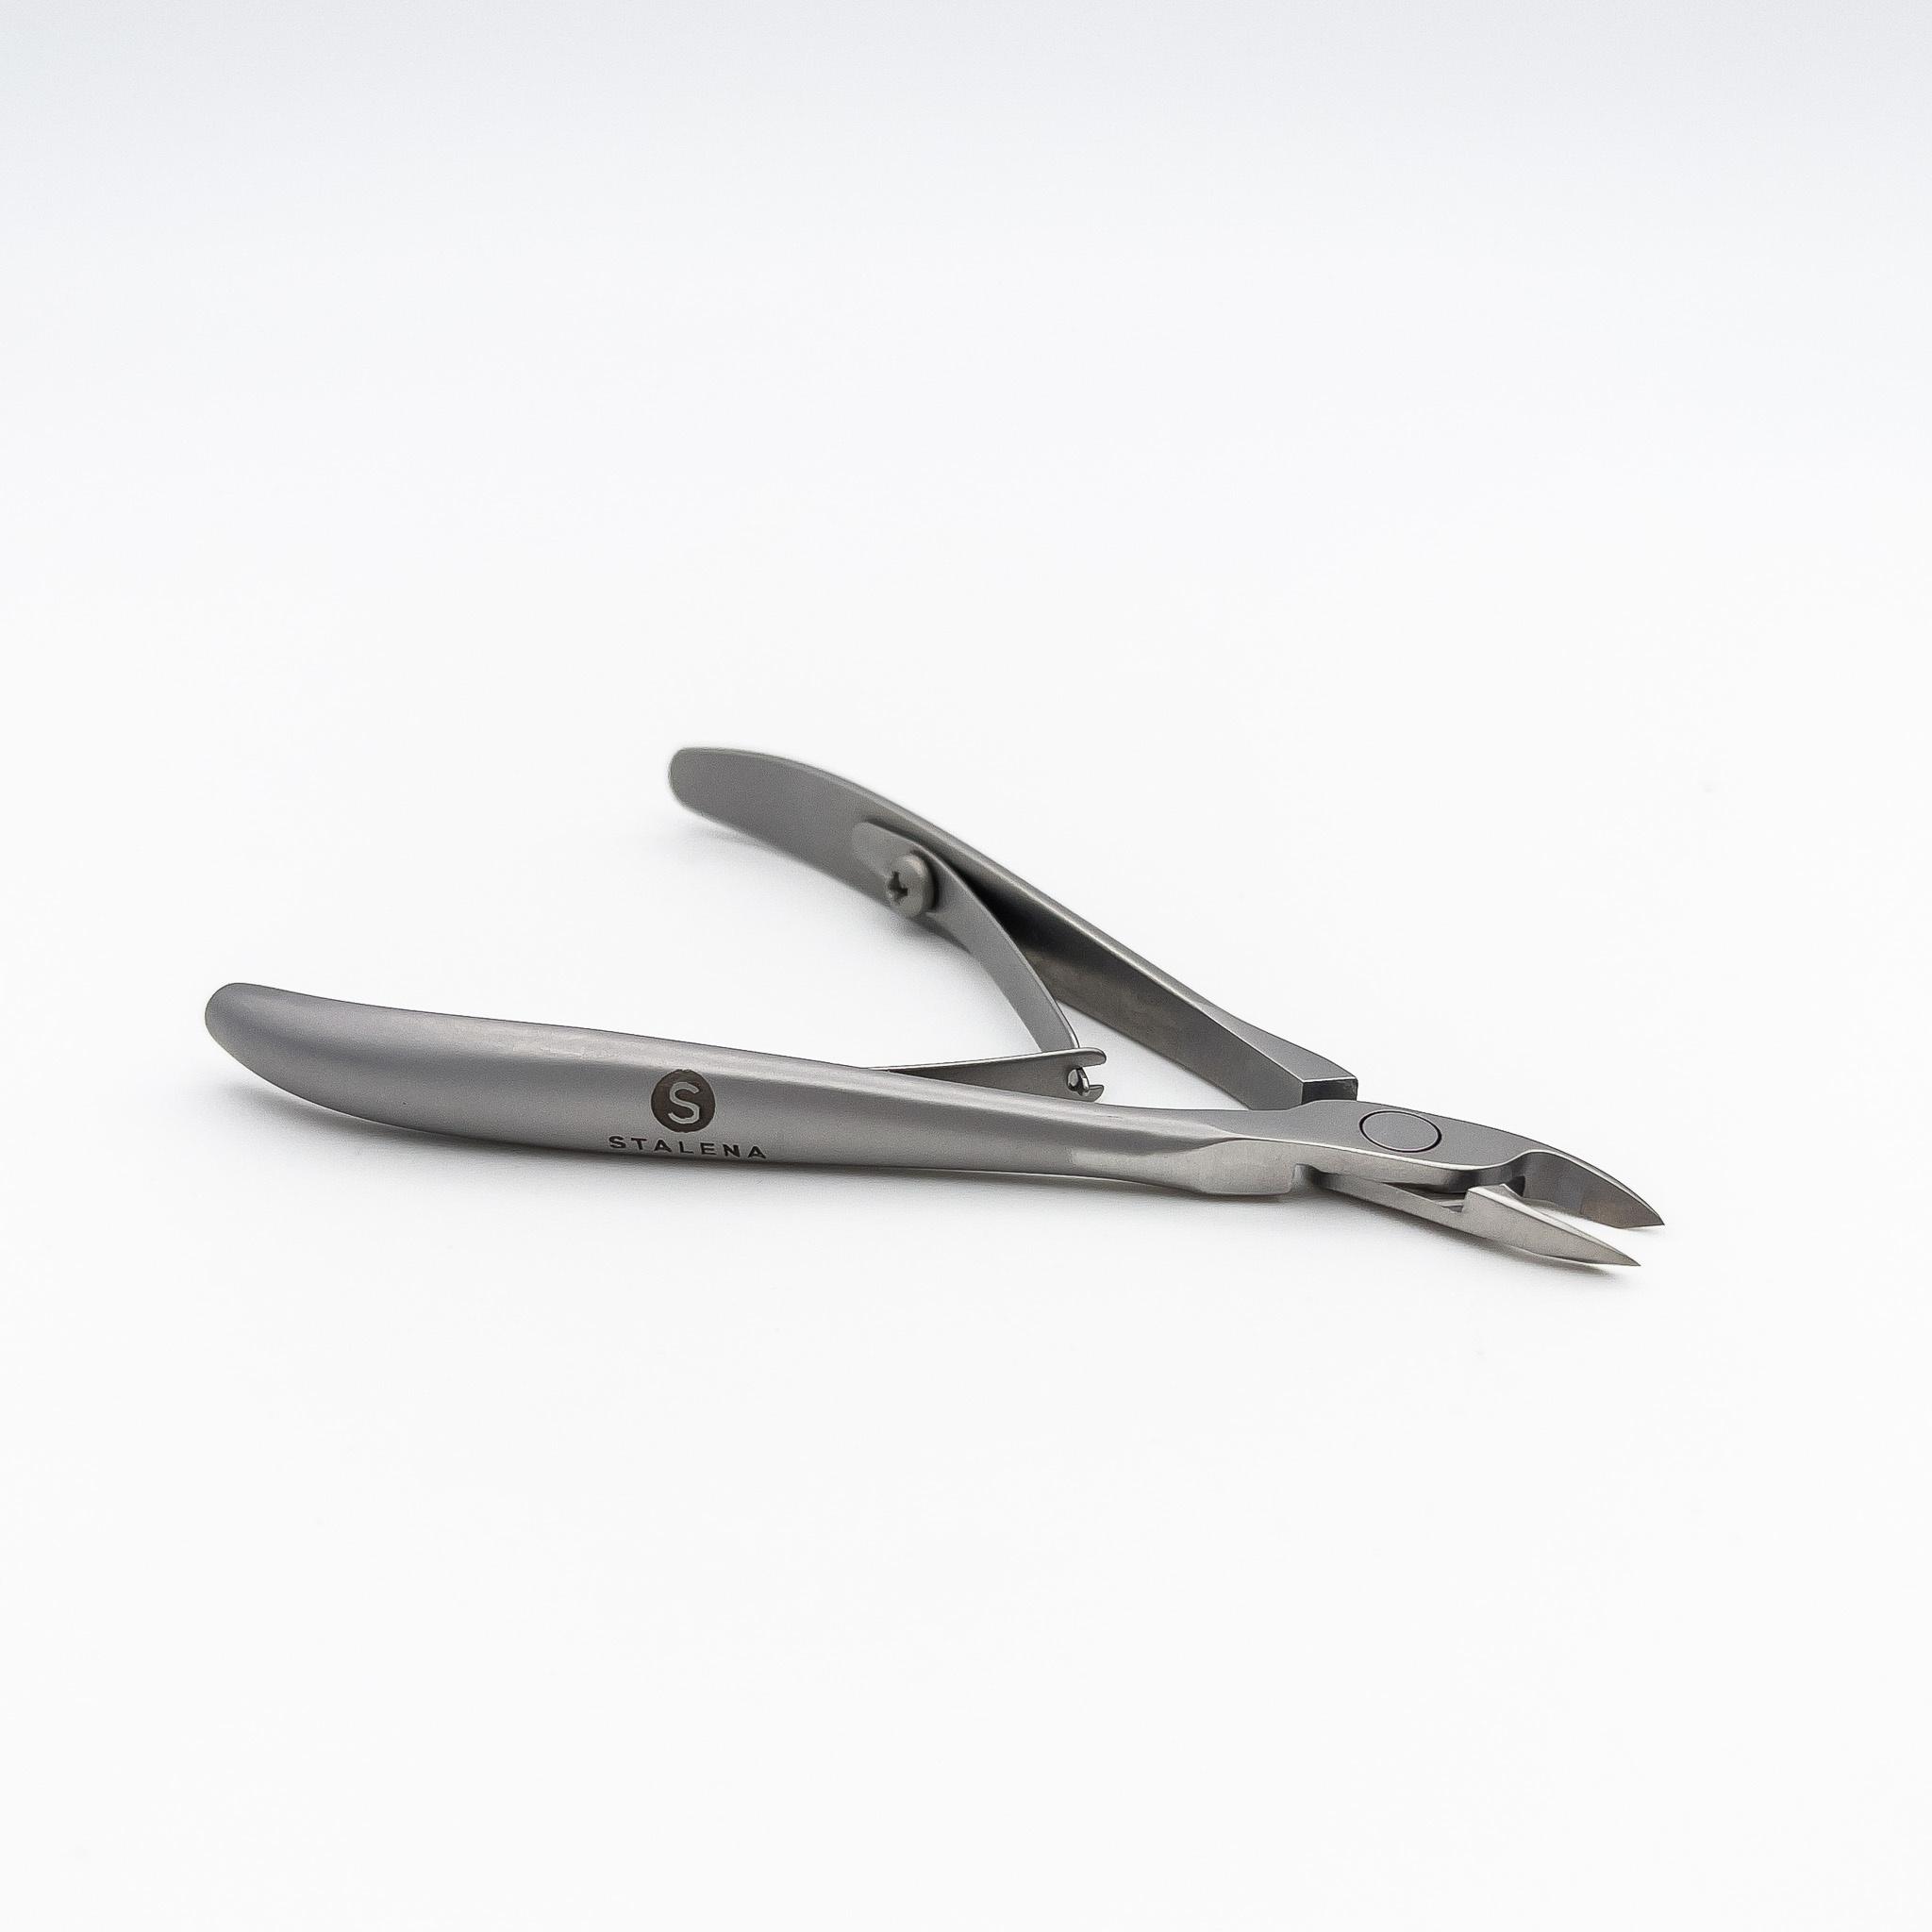 STALENA Pince à peau 3 mm - poignée courte KM-003 (N3-10-03)